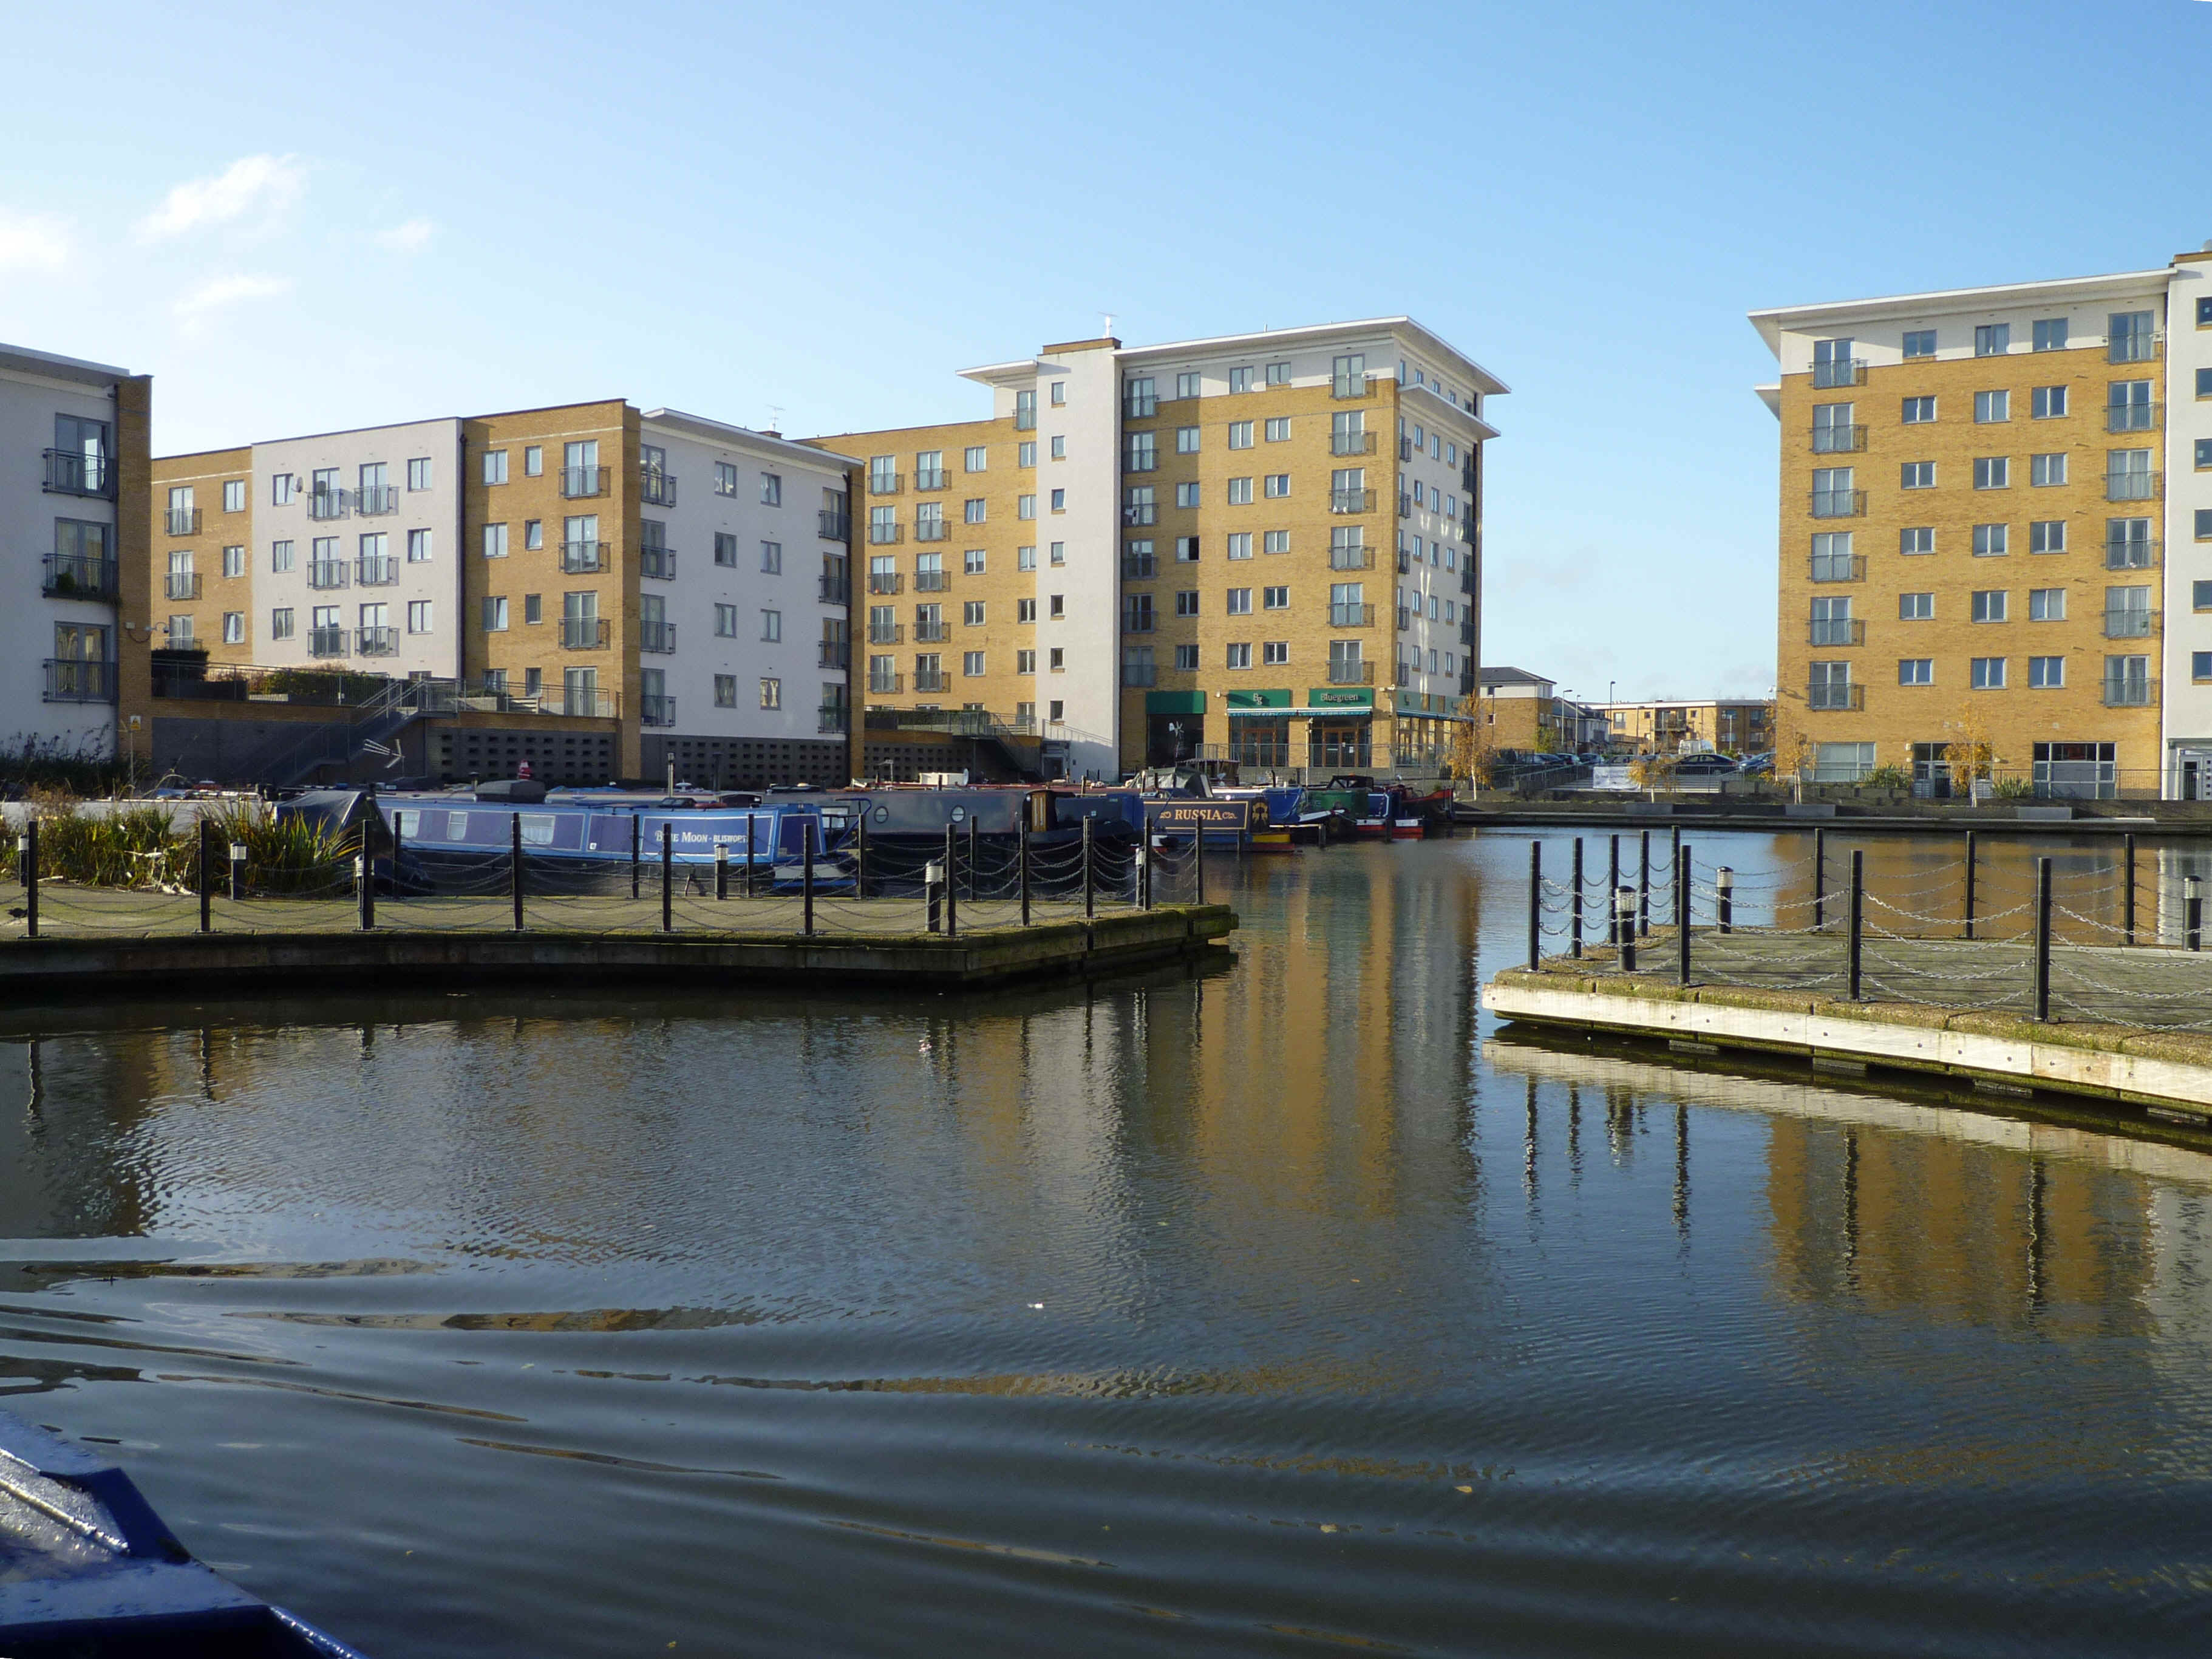 Engineer's Wharf looking very tidy indeed...